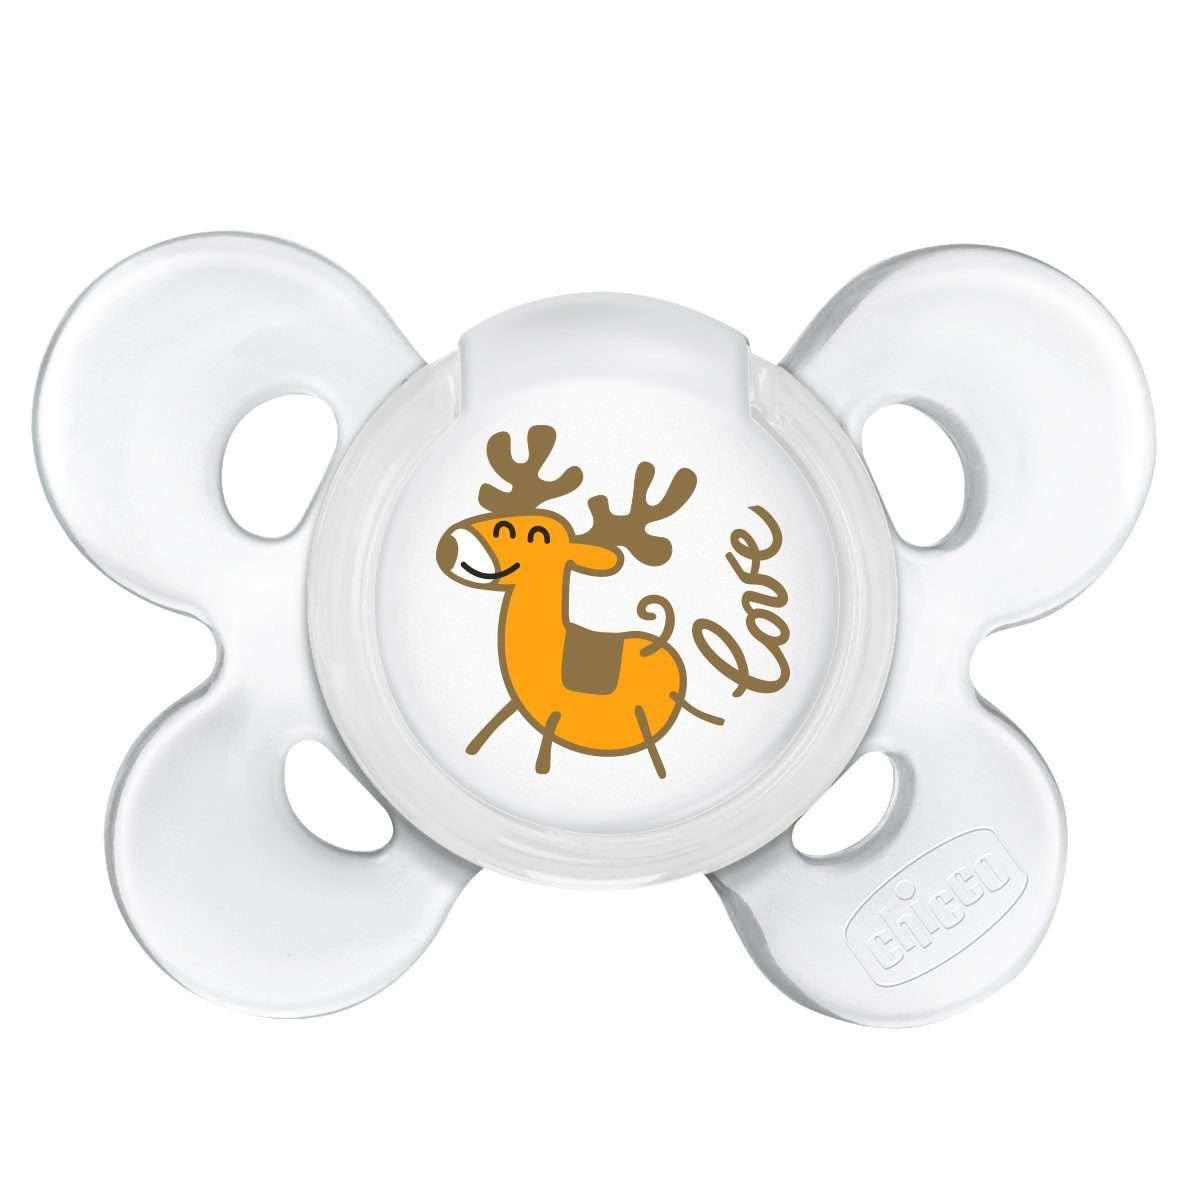 Пустушка Chicco Physio Сomfort Christmas, силікон, 0-6 міс., 1 шт.